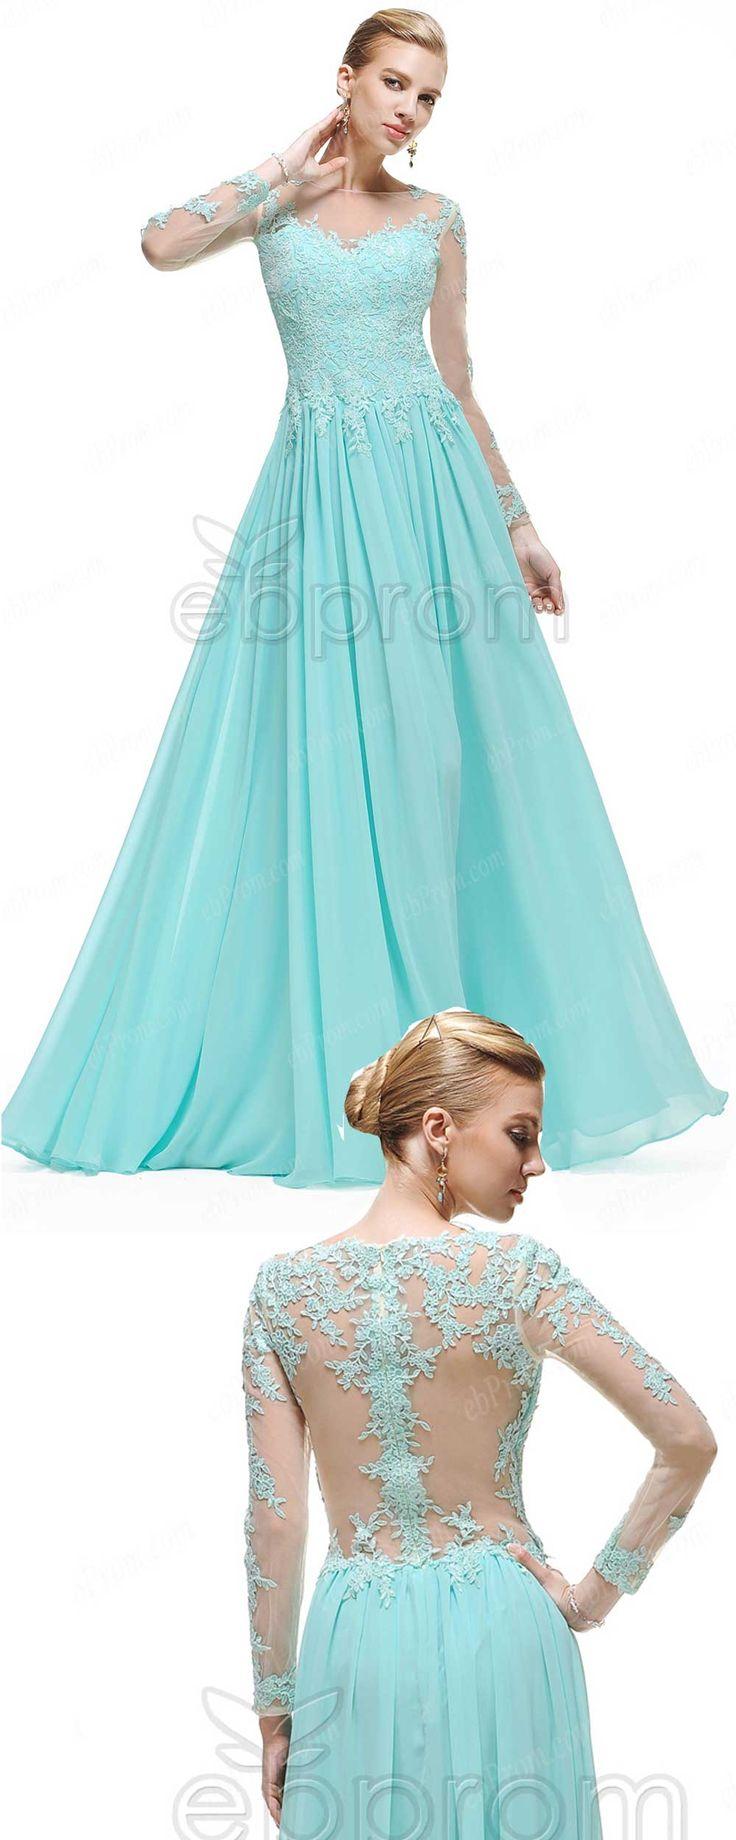 Modest Blue Backless Prom Dresses Long Sleeves Embellished Mesh Back Evening Dresses, Bridesmaid dresses, Wedding Guest Dresses, Formal Gowns